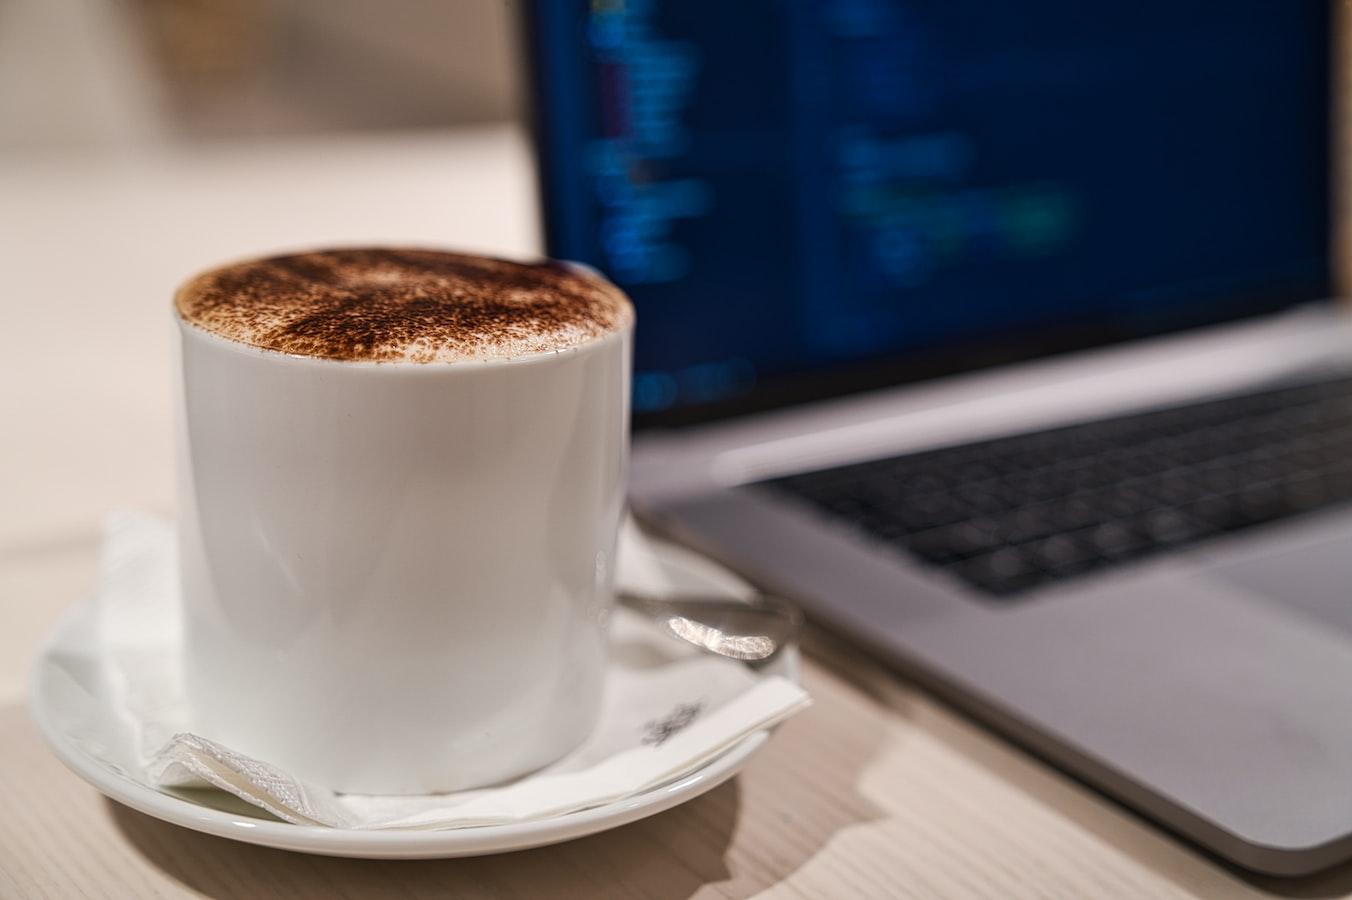 Coffee and Code